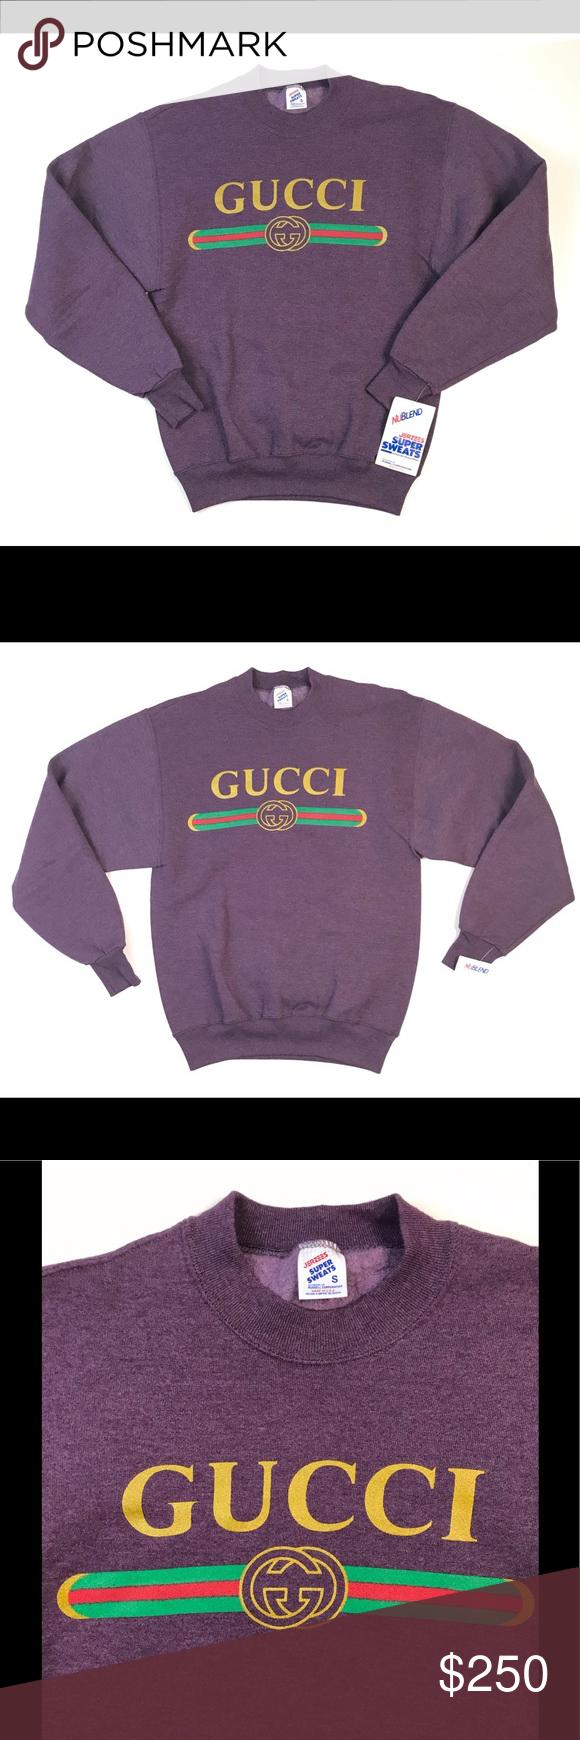 Vintage Gucci Sweater Small S Sweatshirt Crewneck Vintage Gucci Gucci Sweater Sweatshirts [ 1740 x 580 Pixel ]